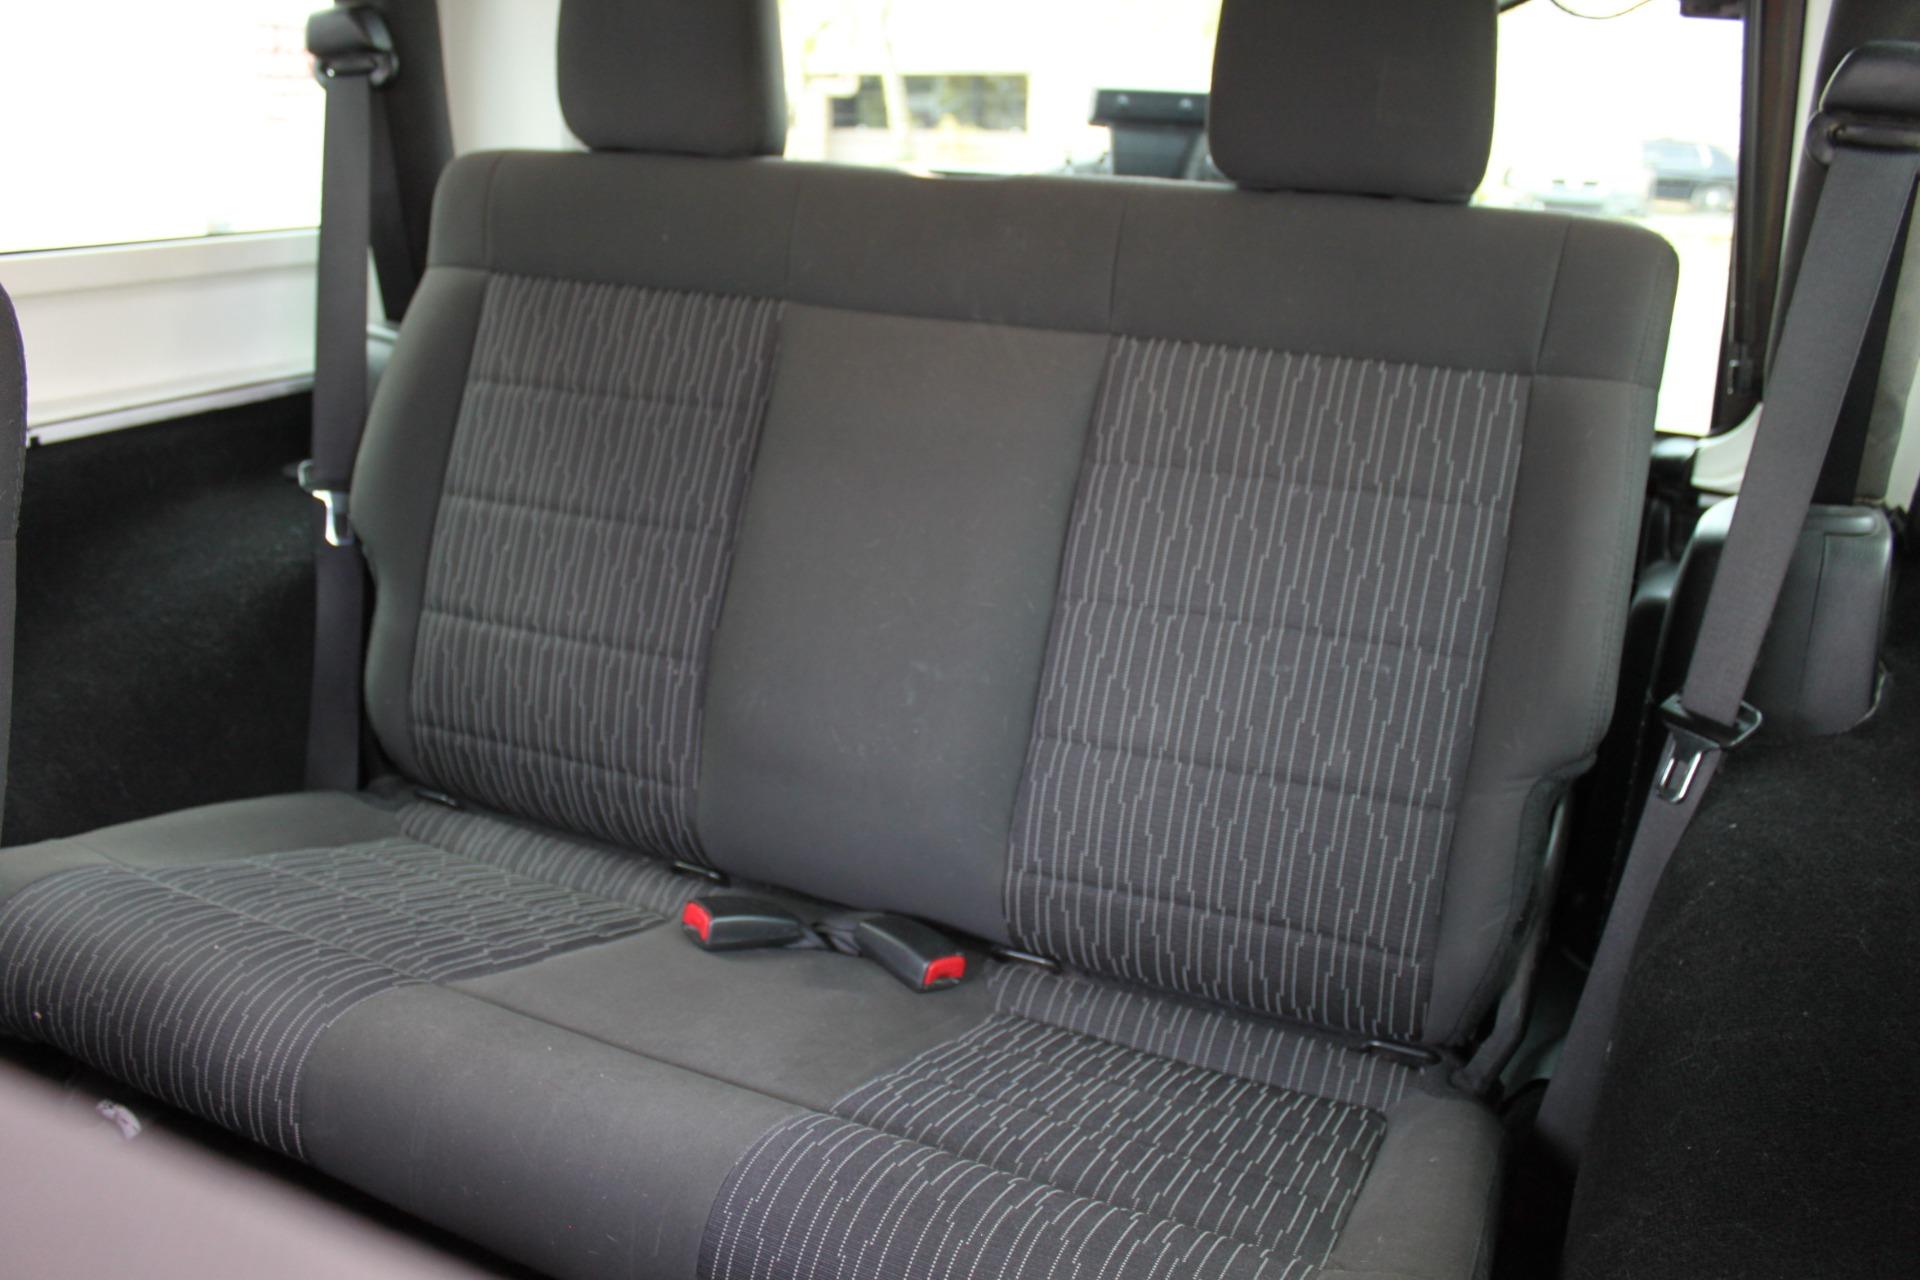 Used-2012-Jeep-Wrangler-Freedom-Edition-4X4-Mopar